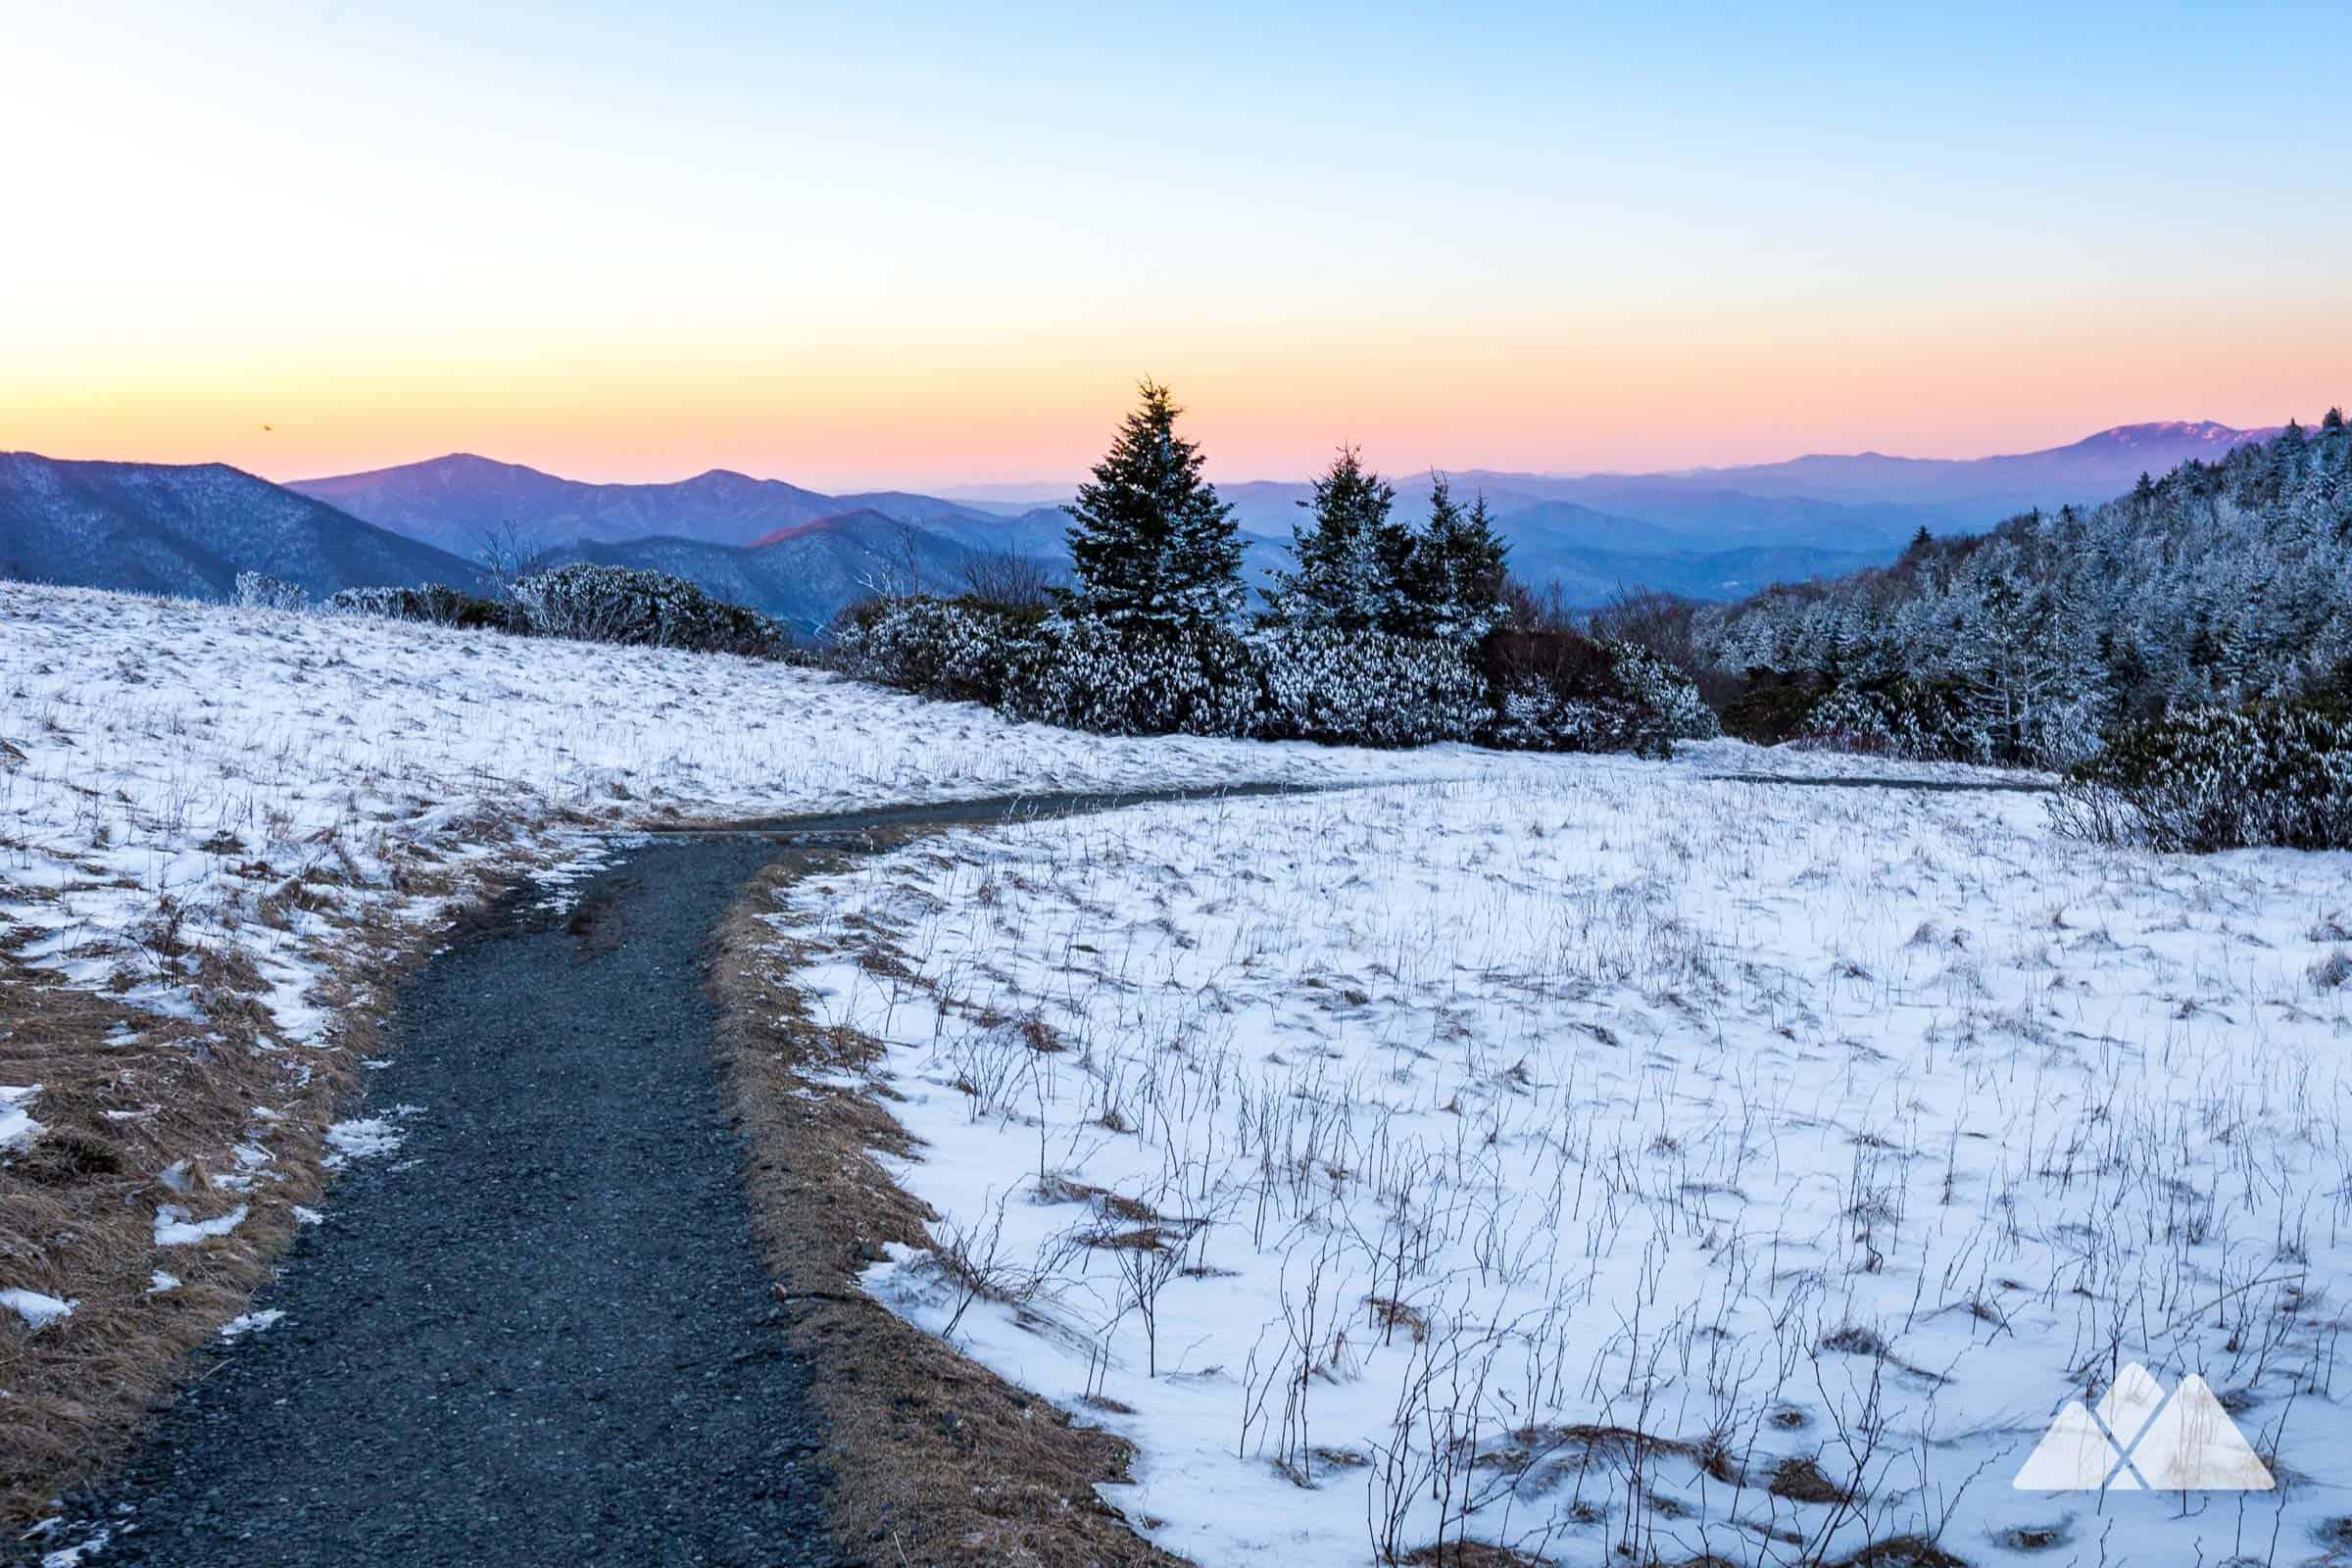 Ireland Fall Wallpaper Roan Mountain Winter Hike On The Appalachian Trail In Nc